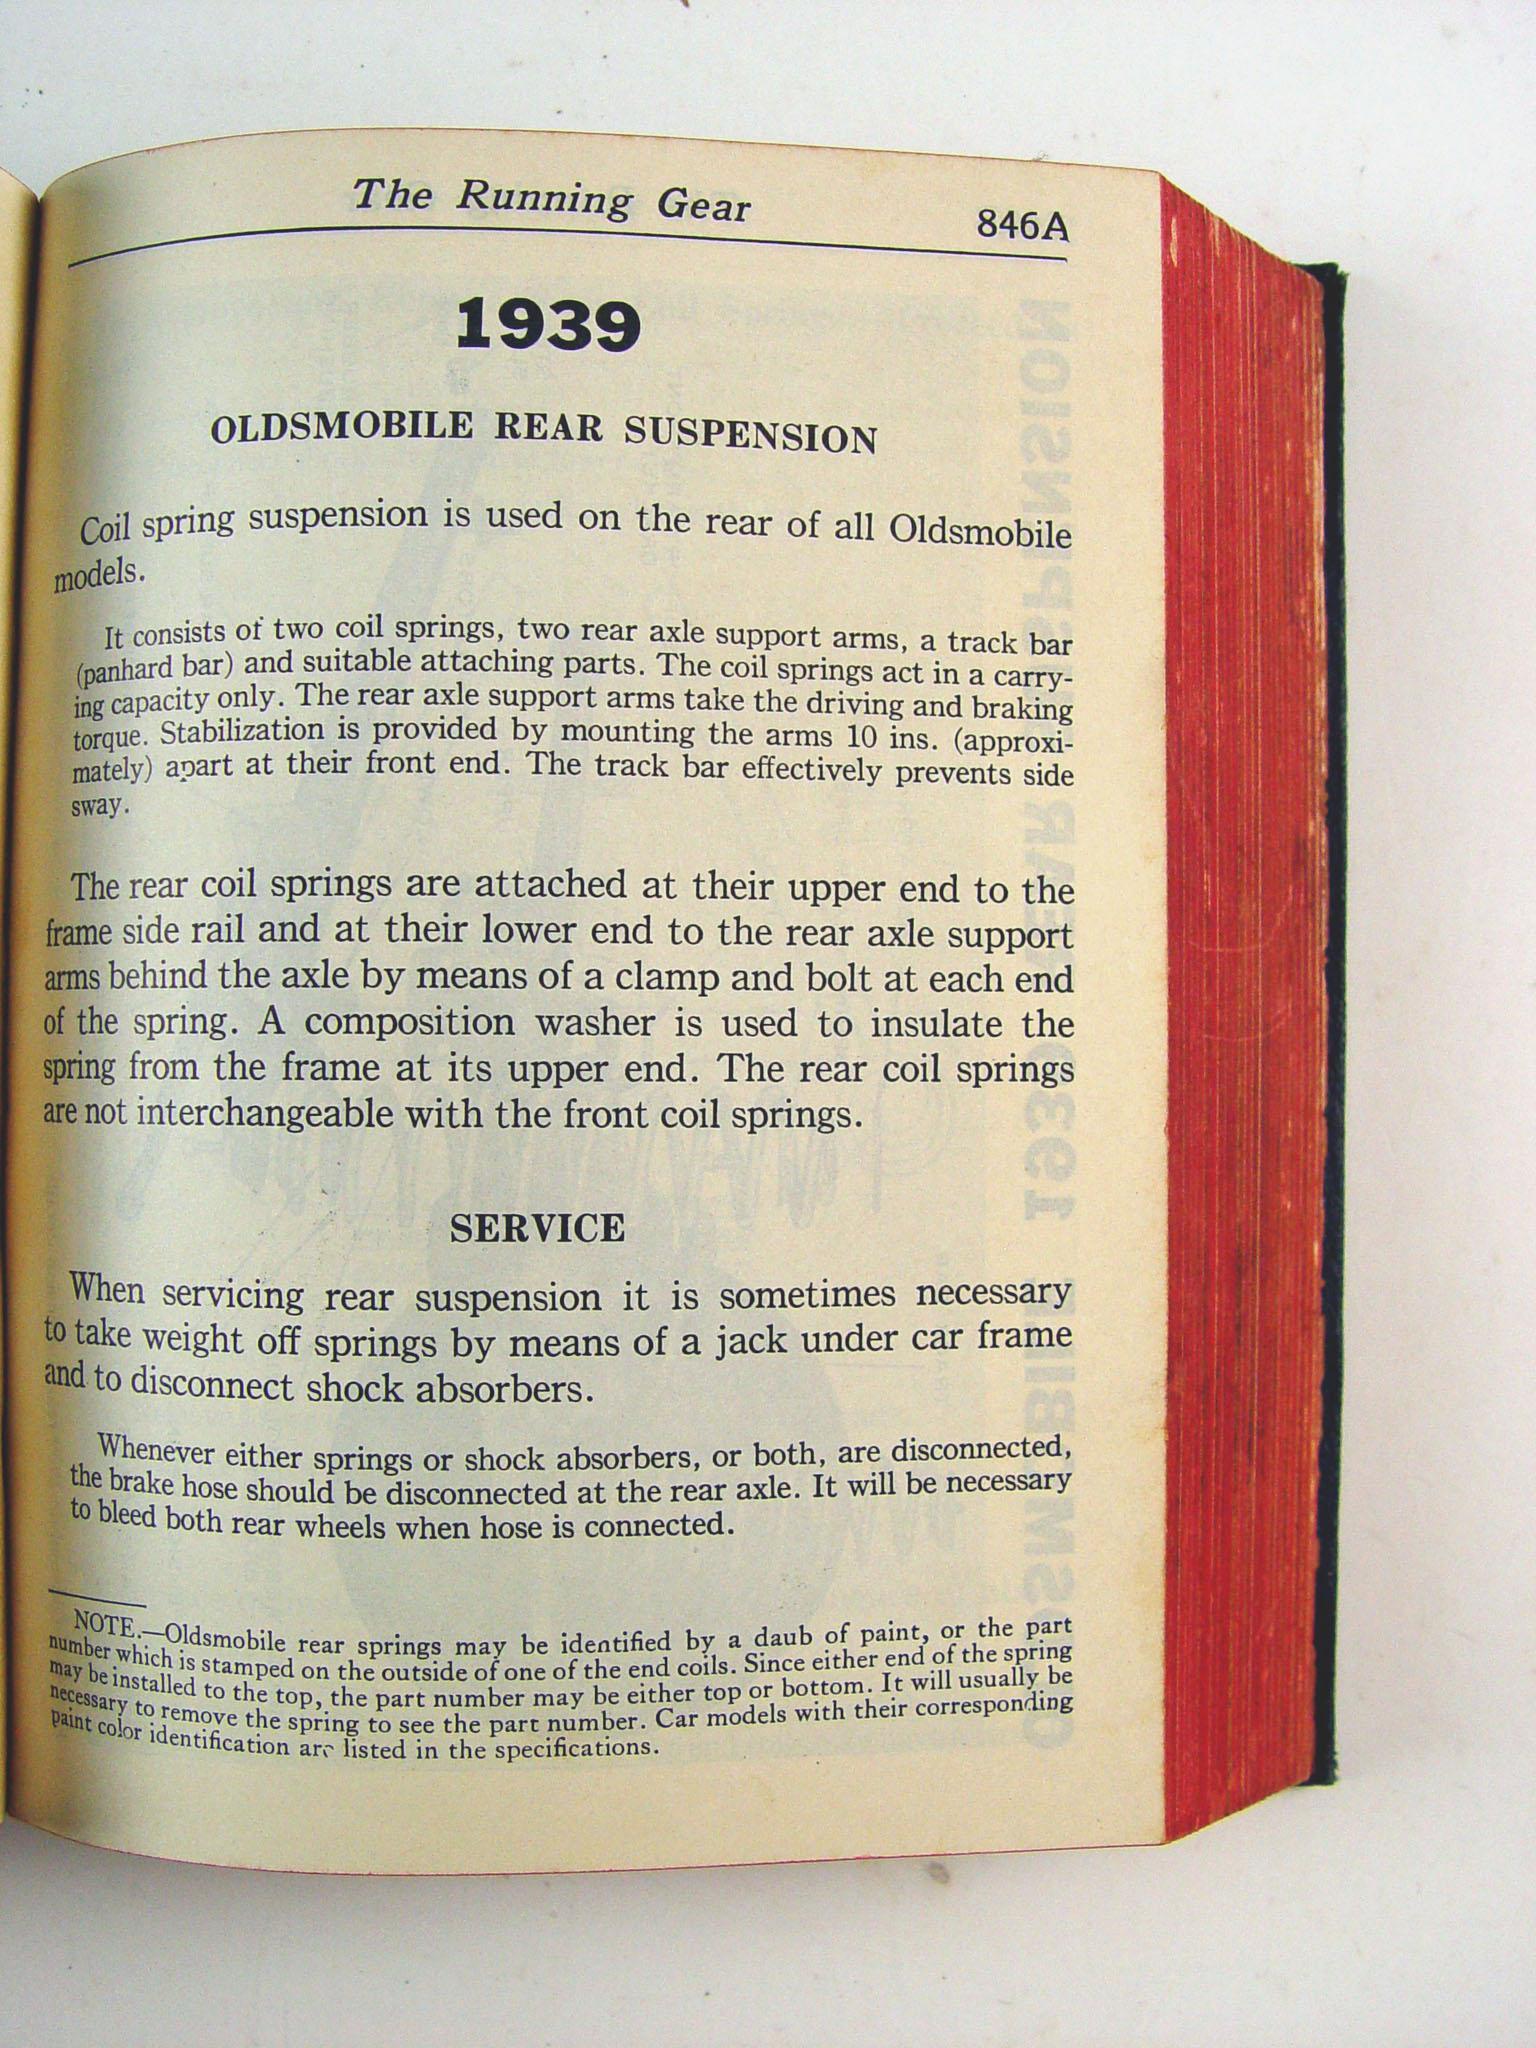 vintage 1940 audel s new automobile guide book chairish rh chairish com Audel Watches Audel LED Watch